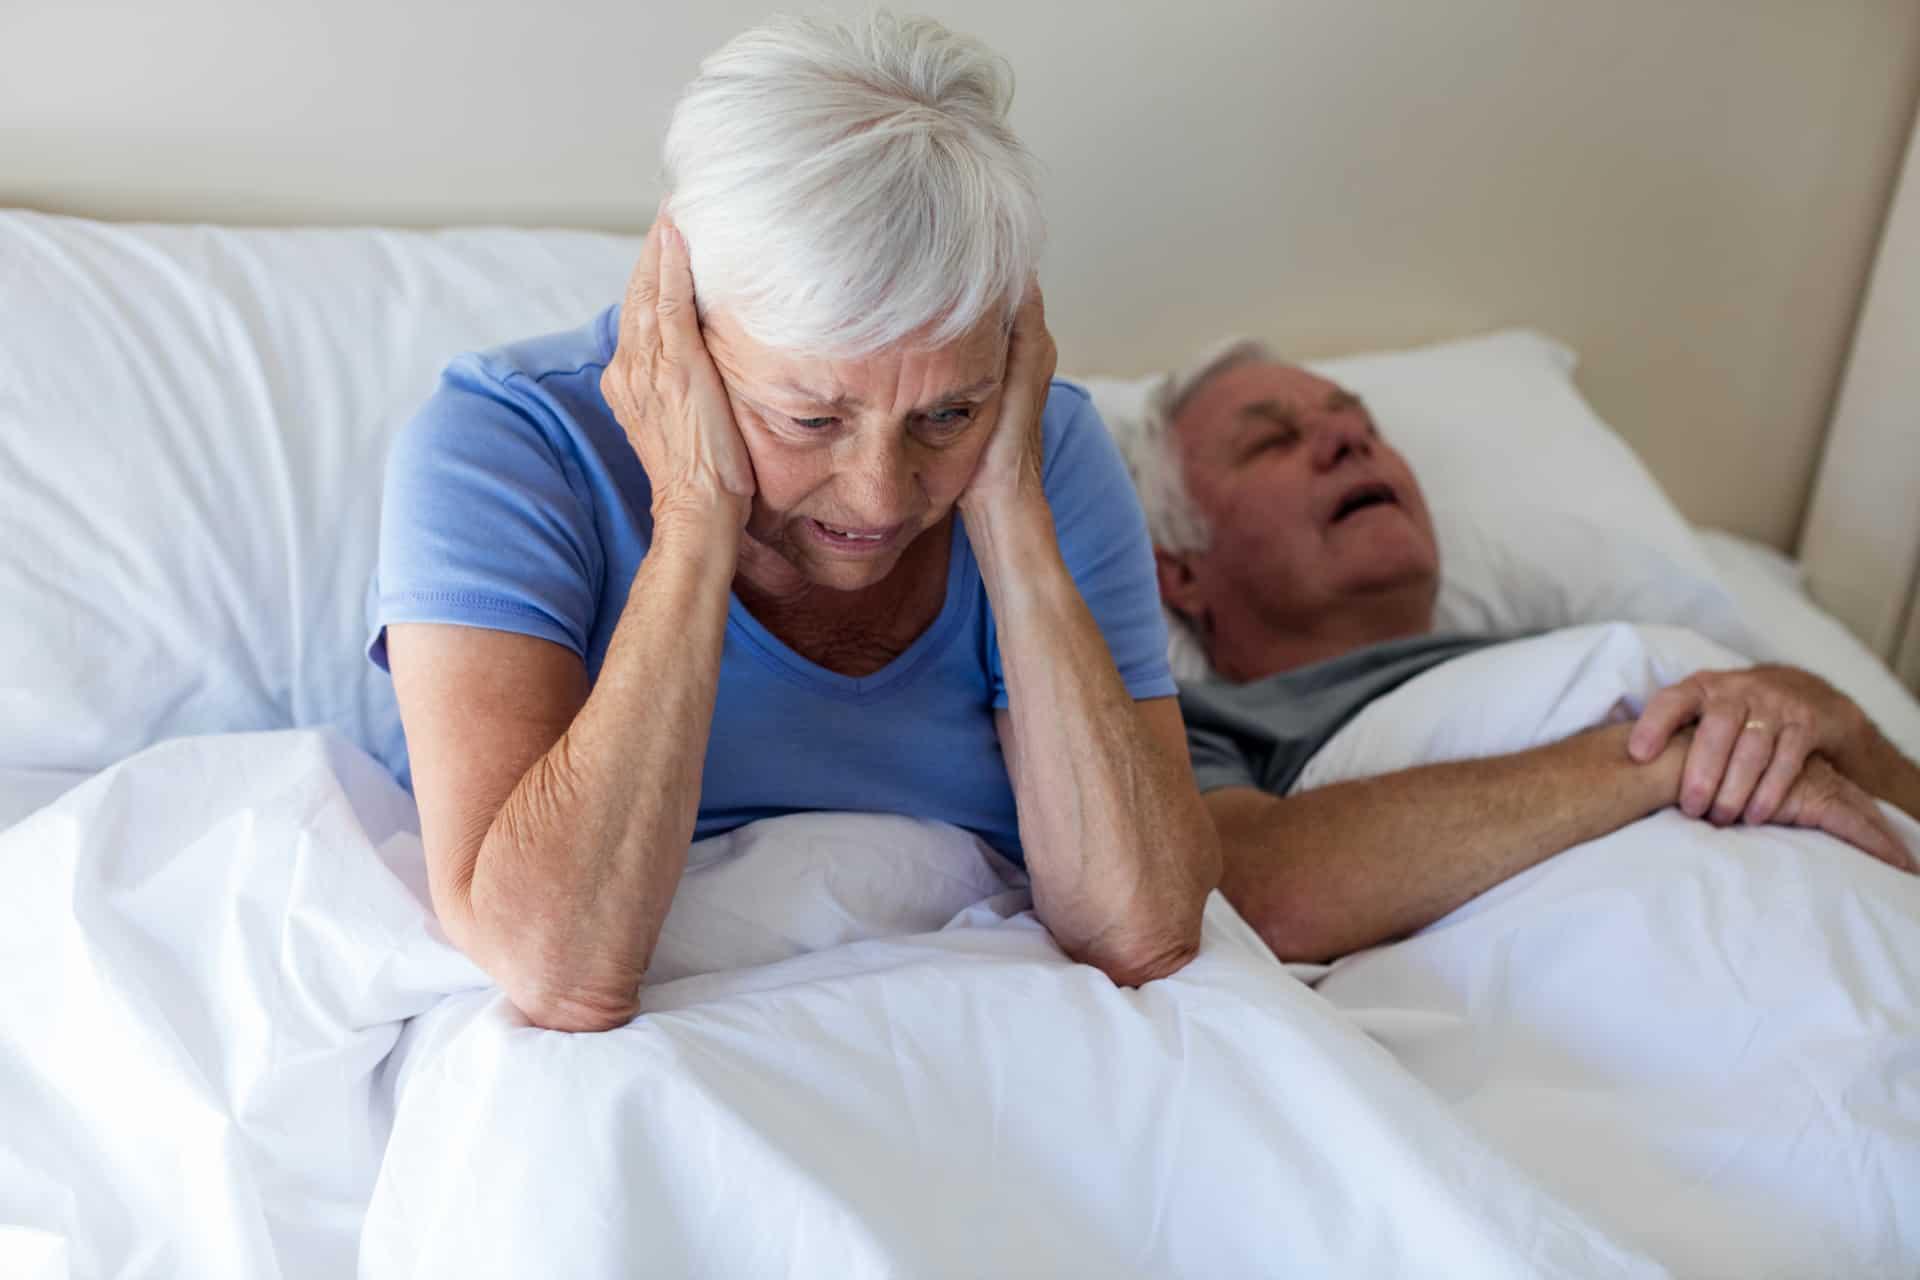 Senior woman disturbed by man snoring